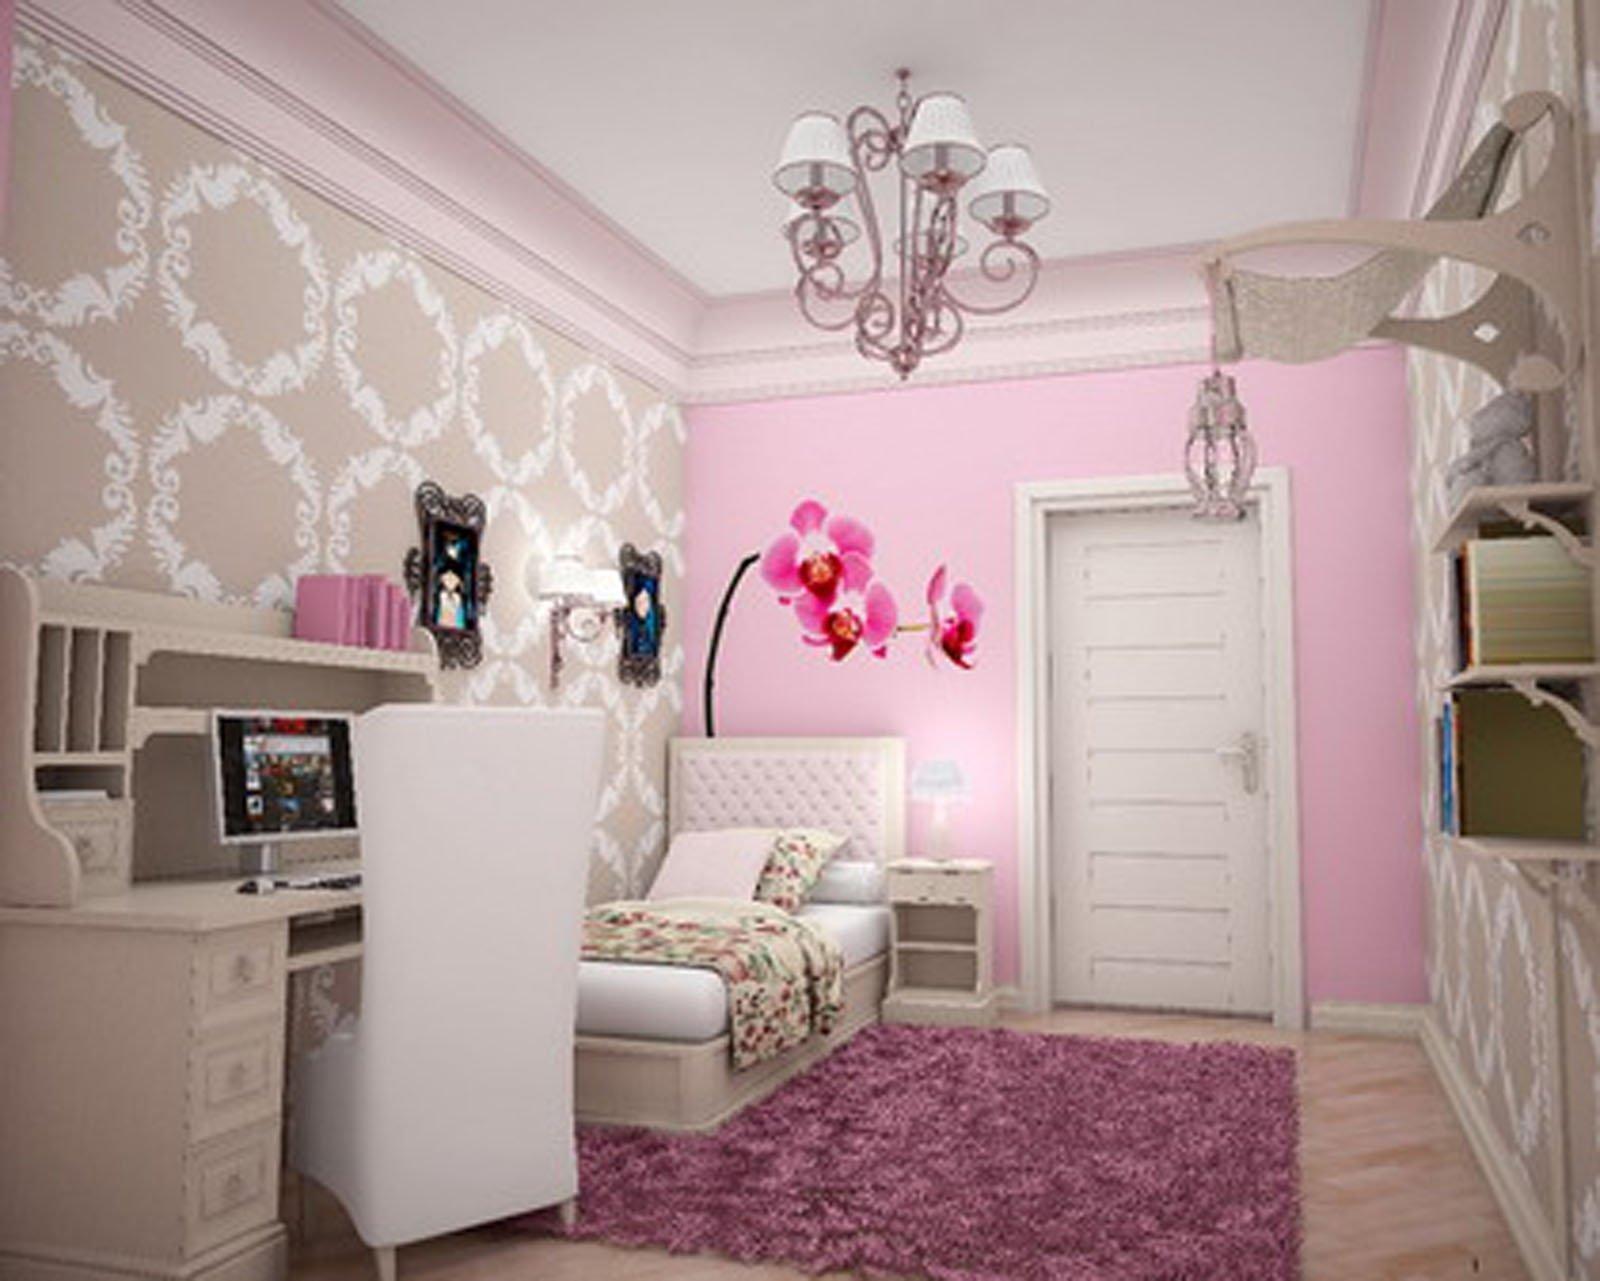 10 Lovely Teenage Girl Bedroom Ideas For Small Rooms teenage girl bedroom designs for small rooms bedroom simple teenage 2021